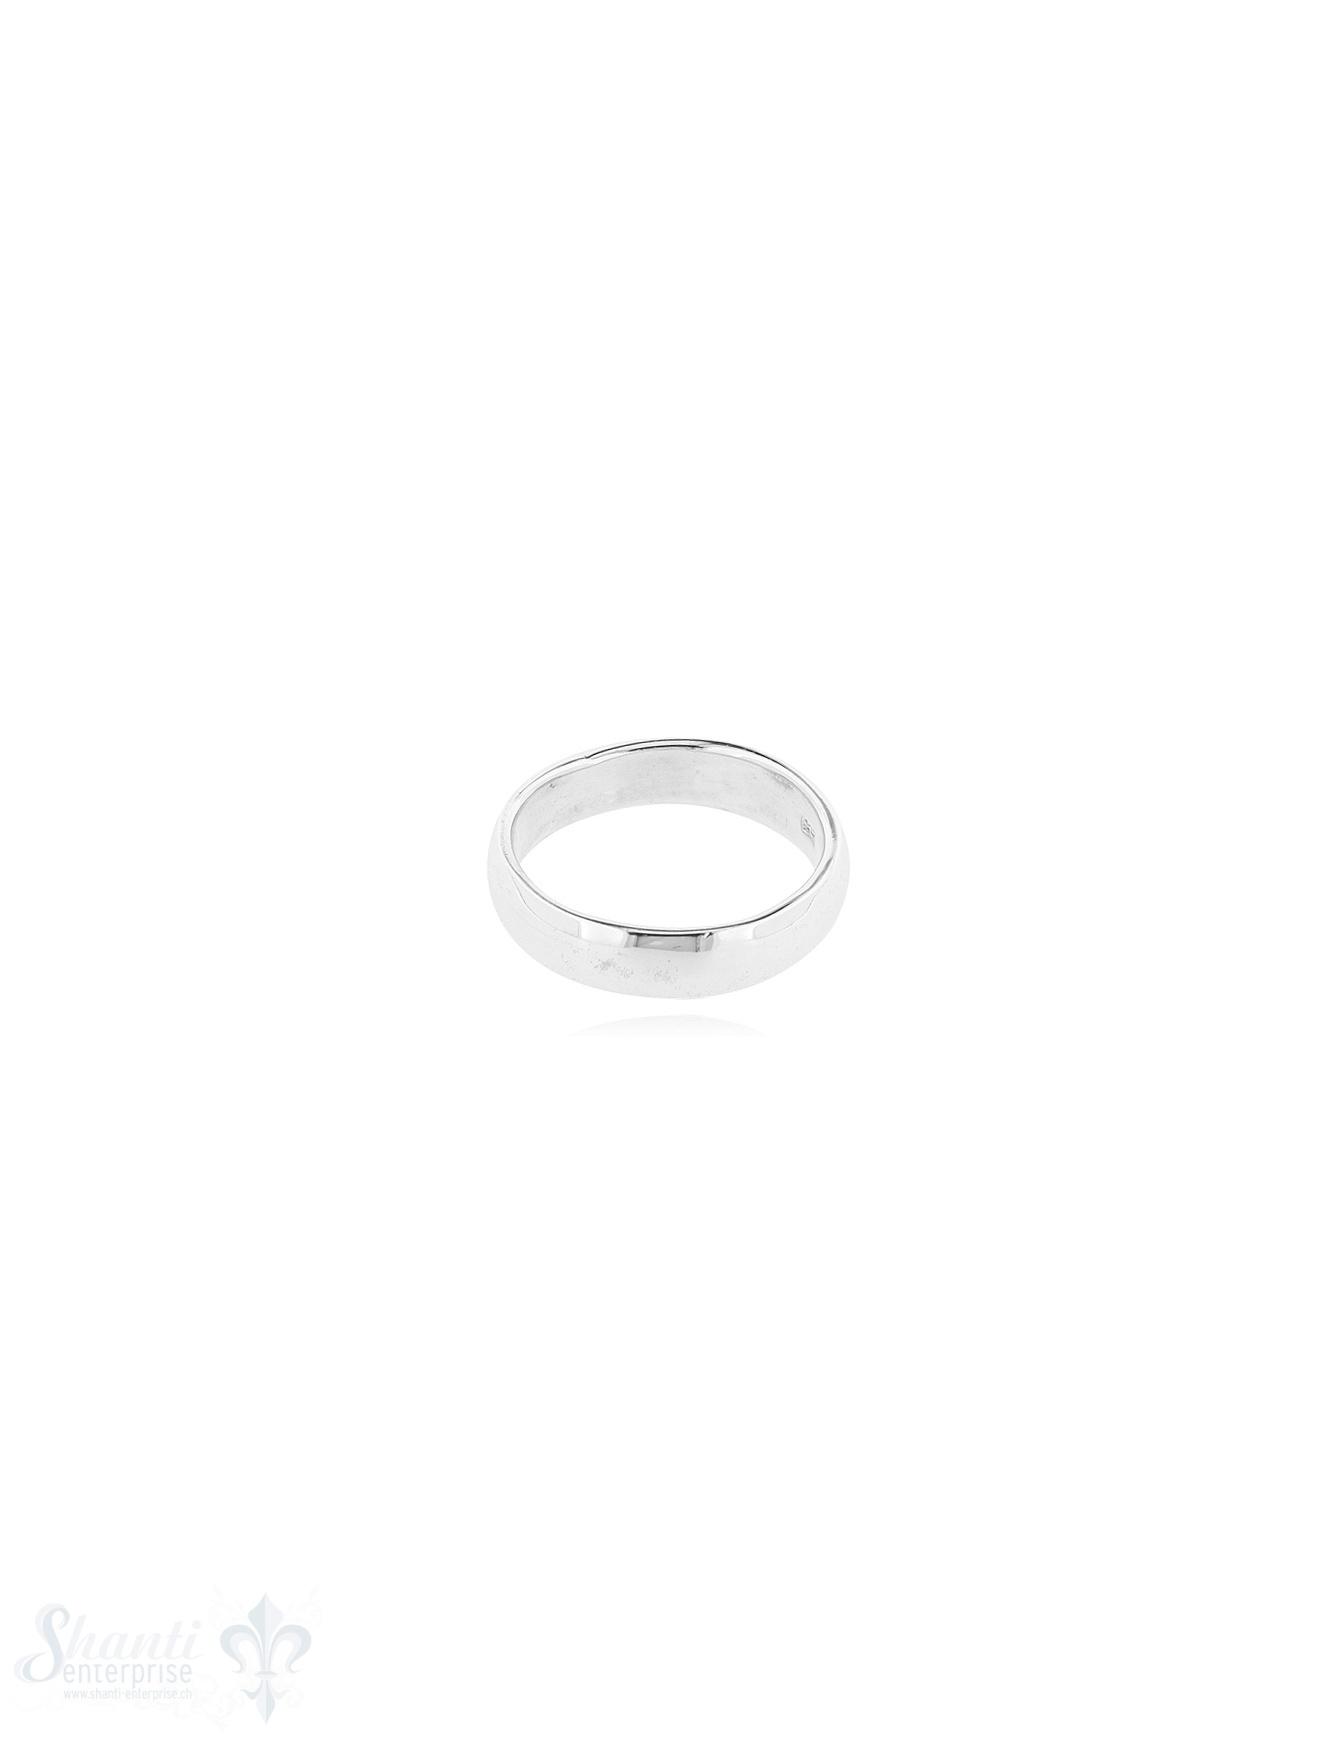 Silberring hell leicht gewölbt 4.2 mm breit